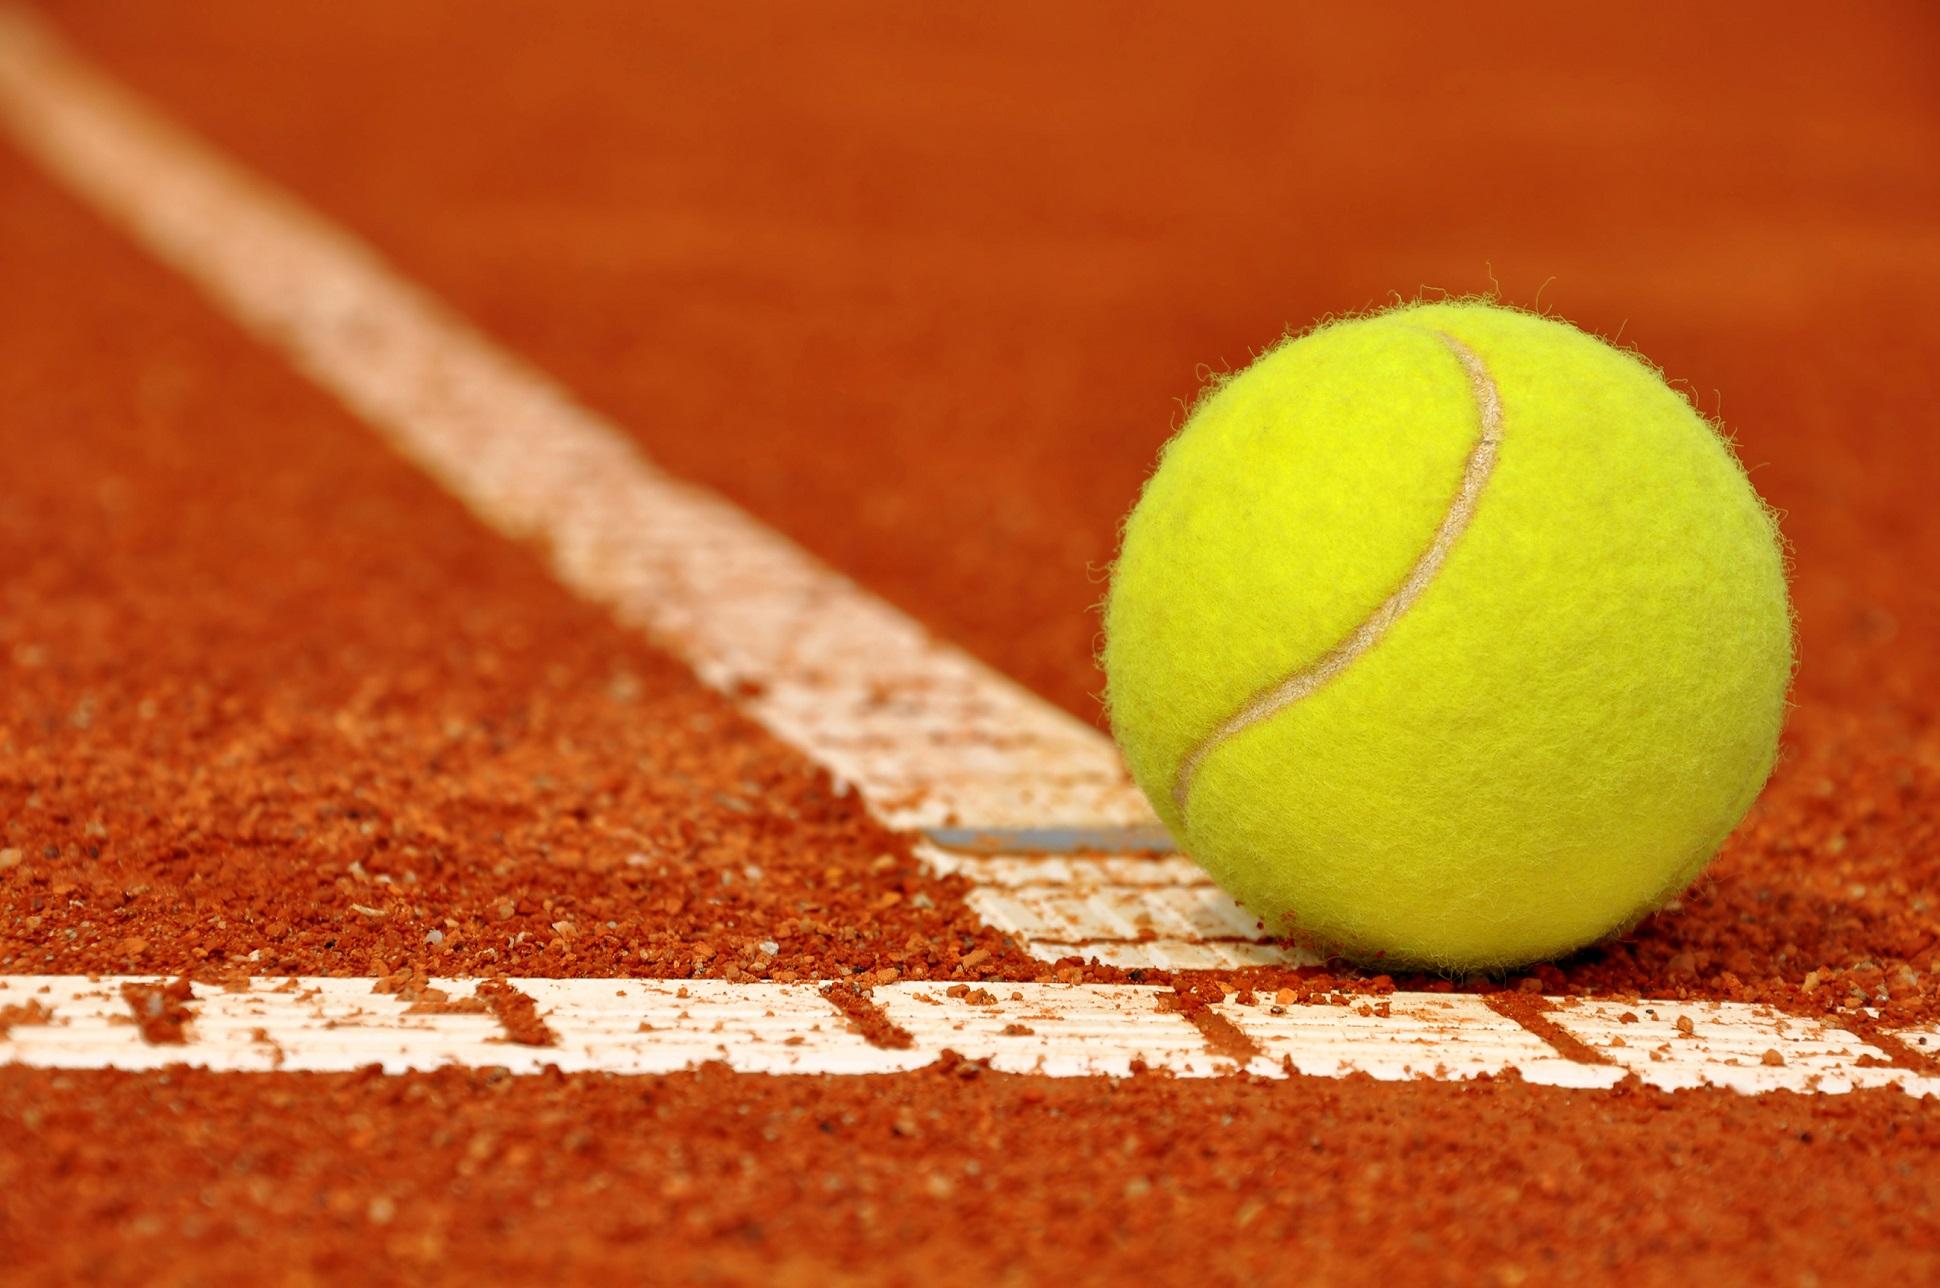 Blog - Des vacances bien sportives en Presqu'île de Guérande - © otilbpg - tennis-vencav-fotolia-com-1765241